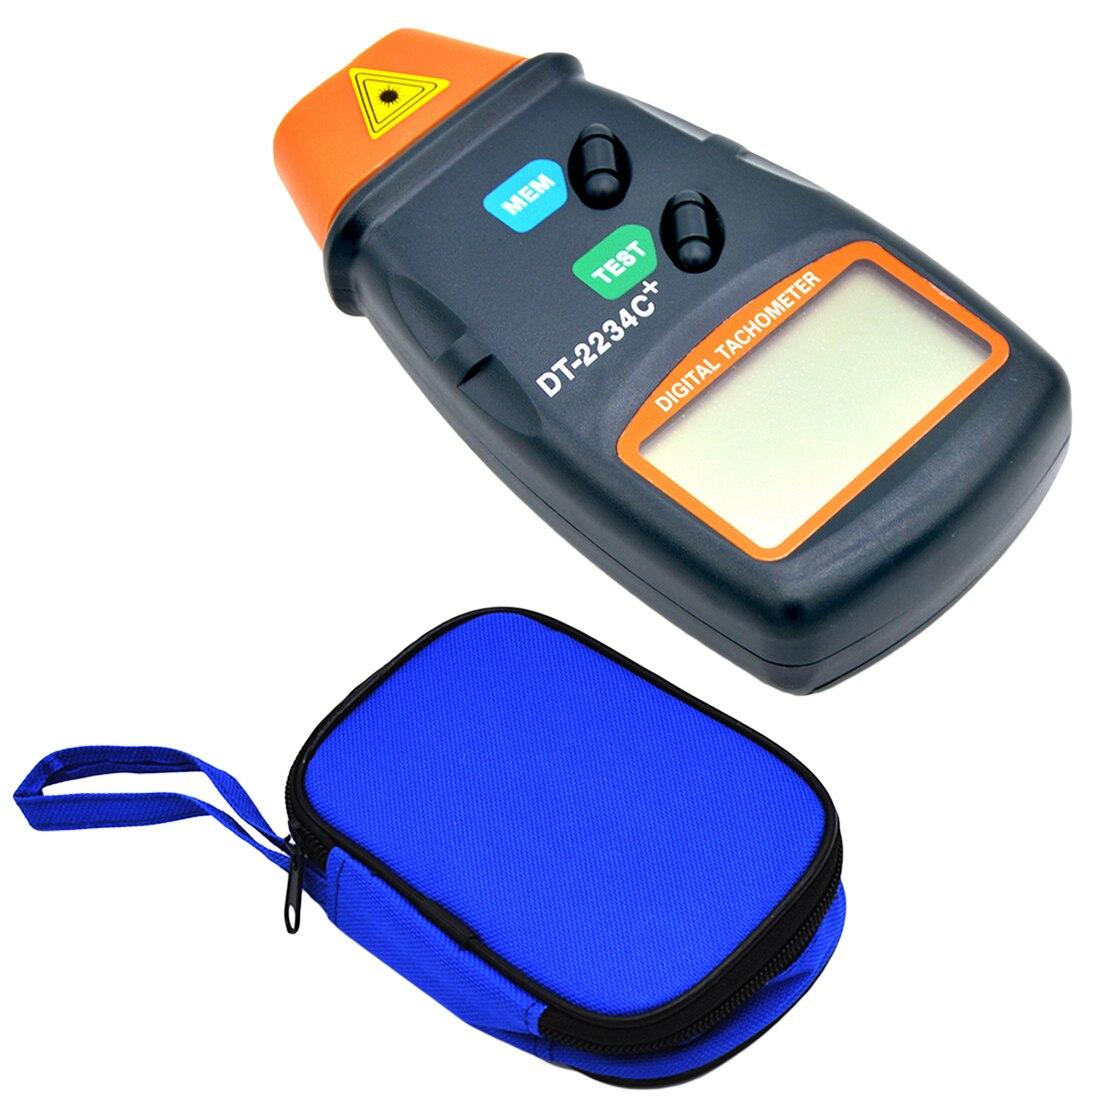 Super Reflective Tape for Laser Photo Tachometer RPM Measurement Tach 2 Strips